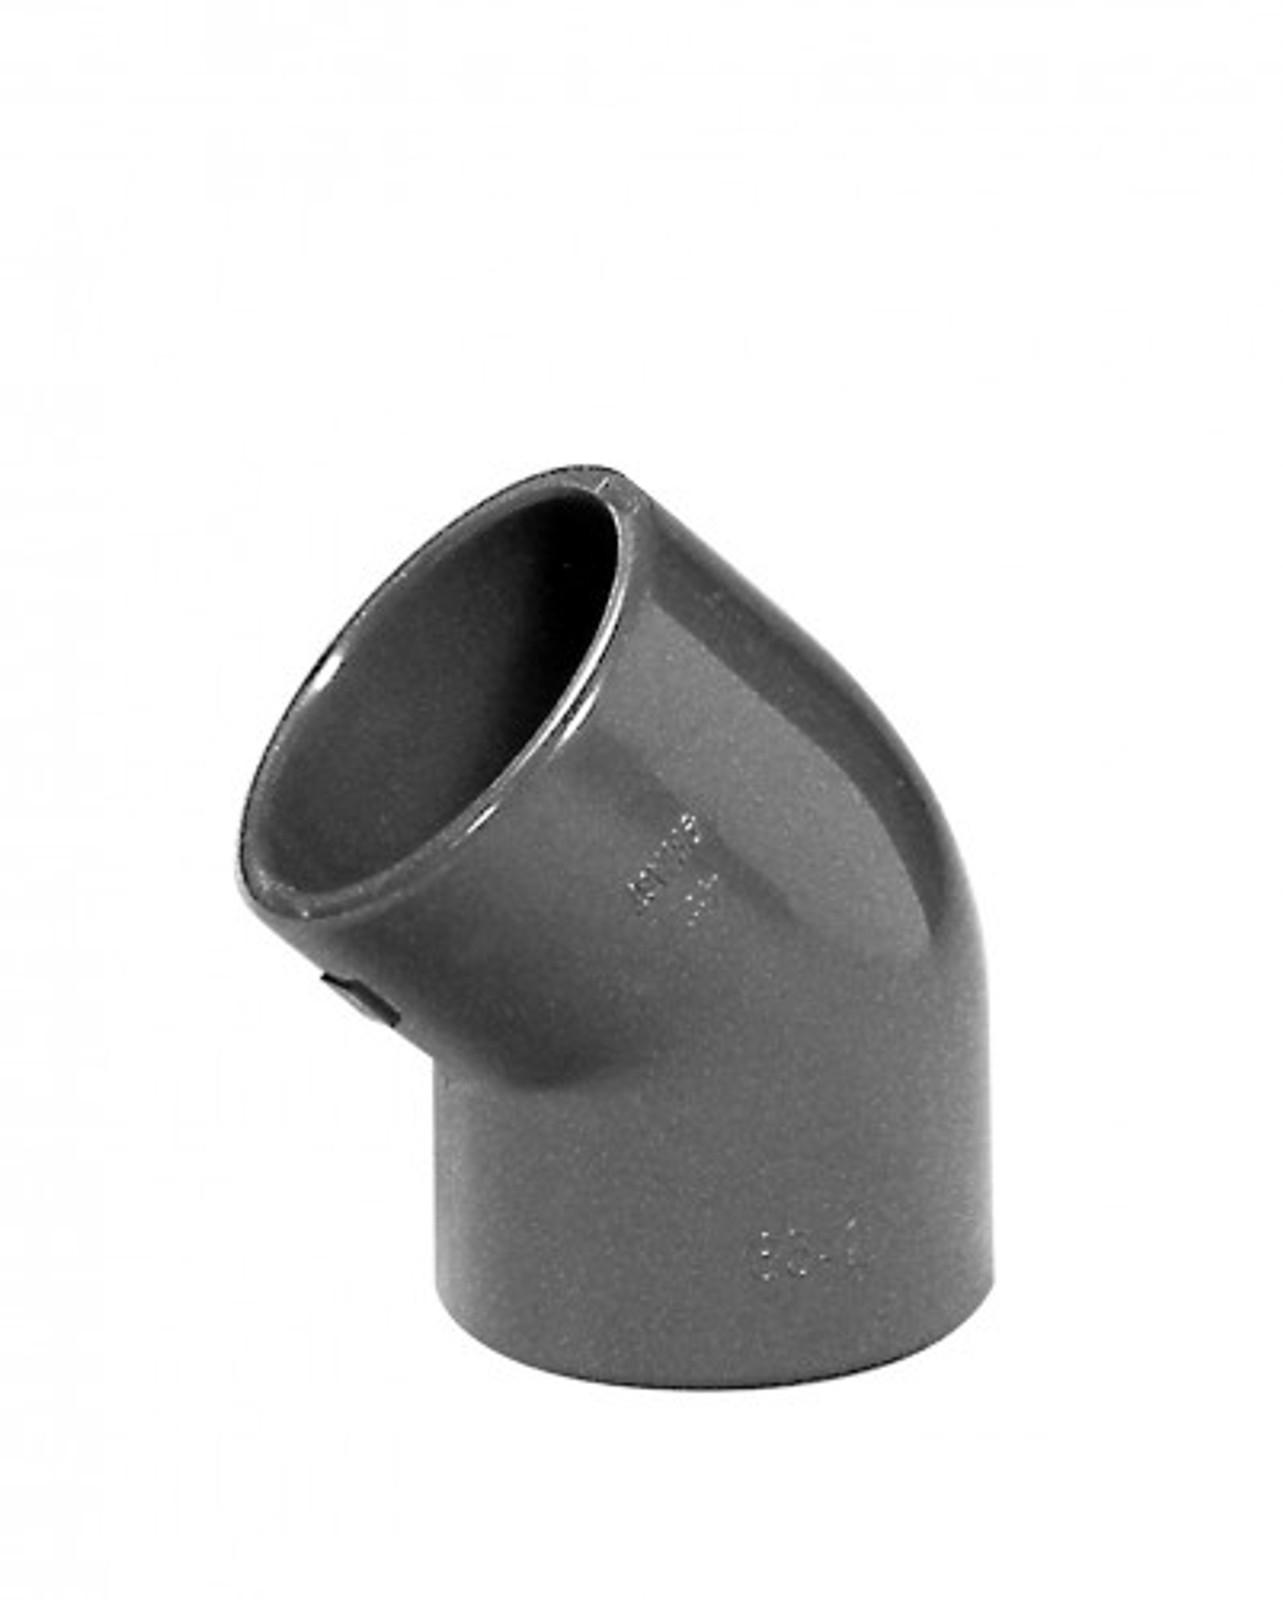 Winkel 45°, 90 mm aus PVC